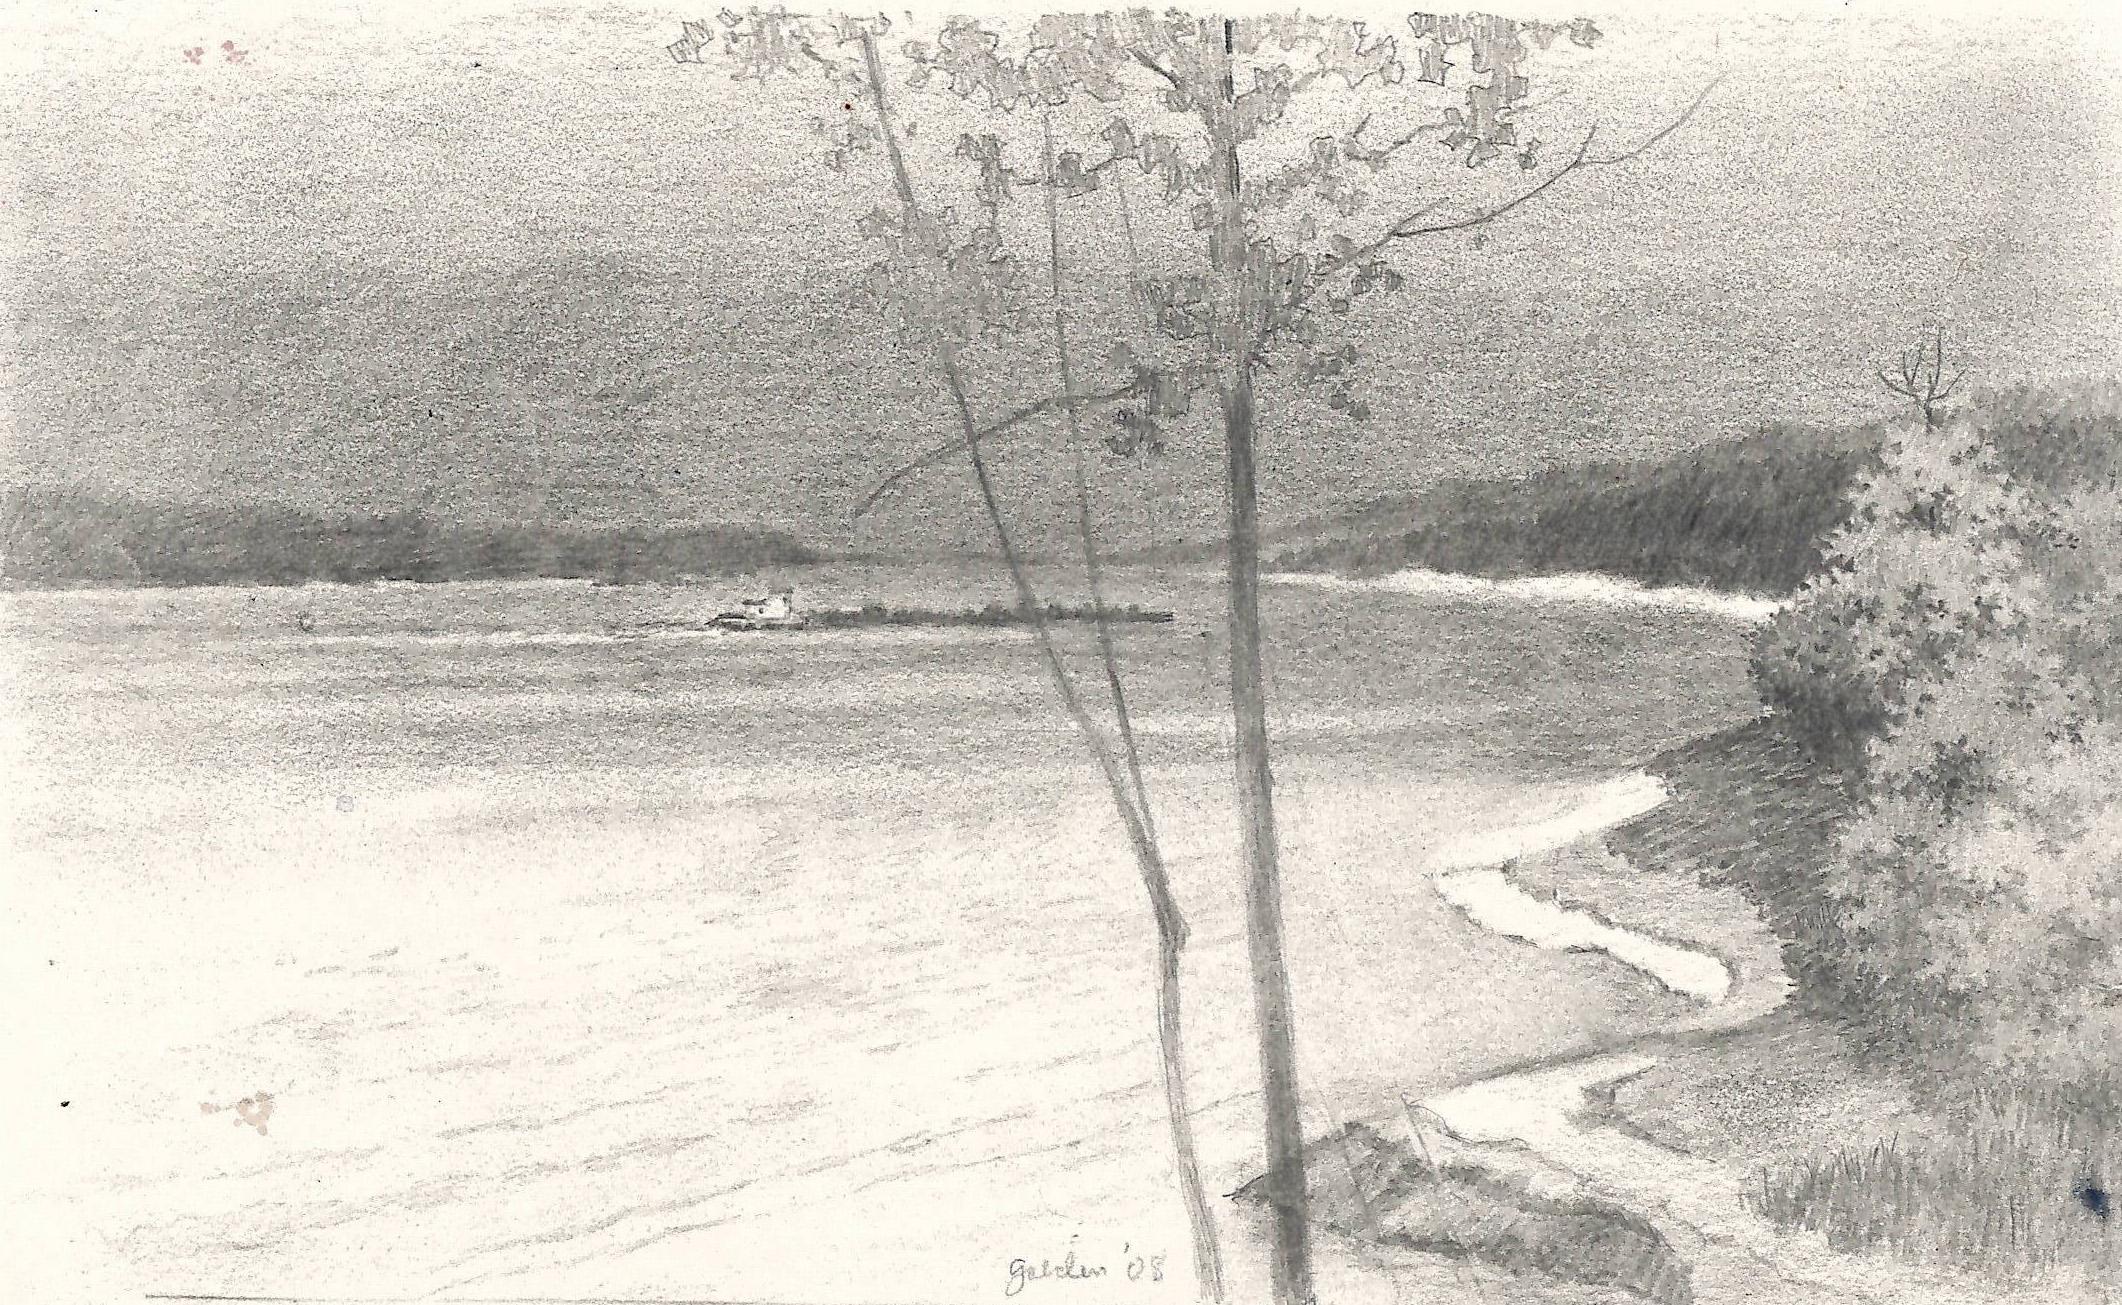 Barge on the Mississippi (2008)